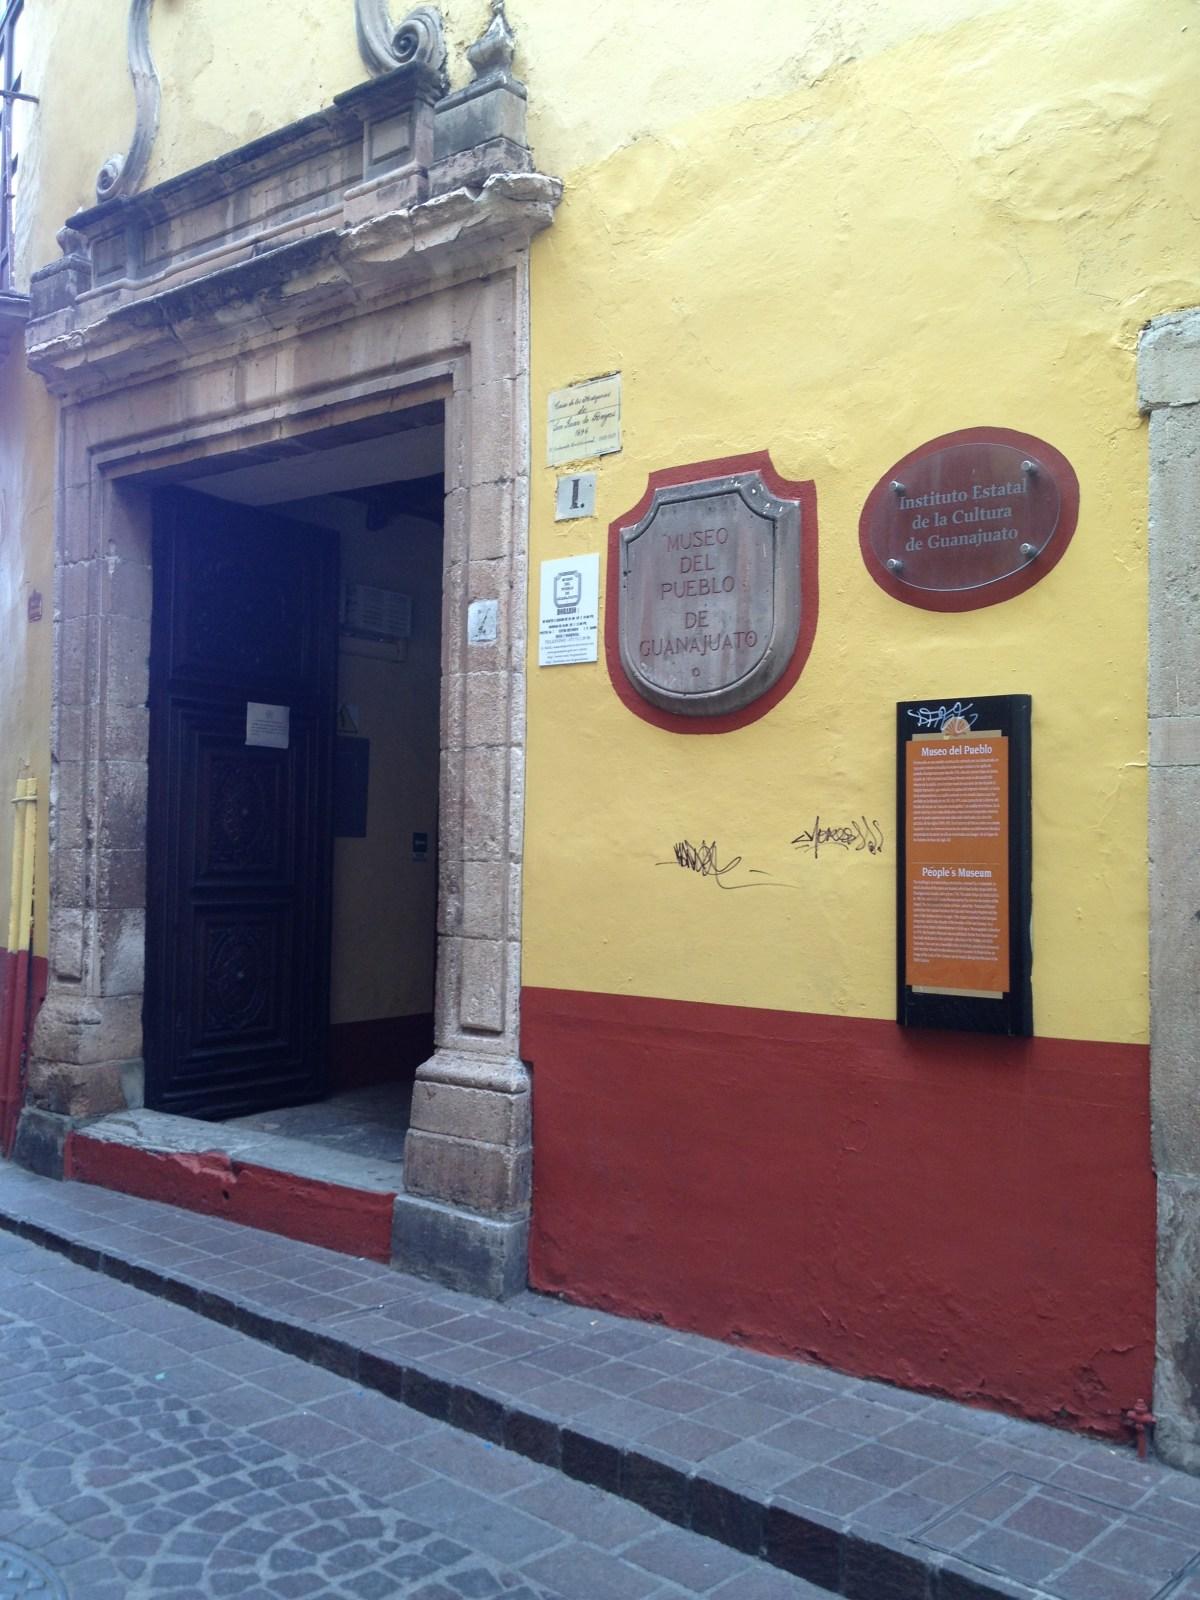 Museo del Pueblo, Guanajuato Mexico — By Jennifer Shipp